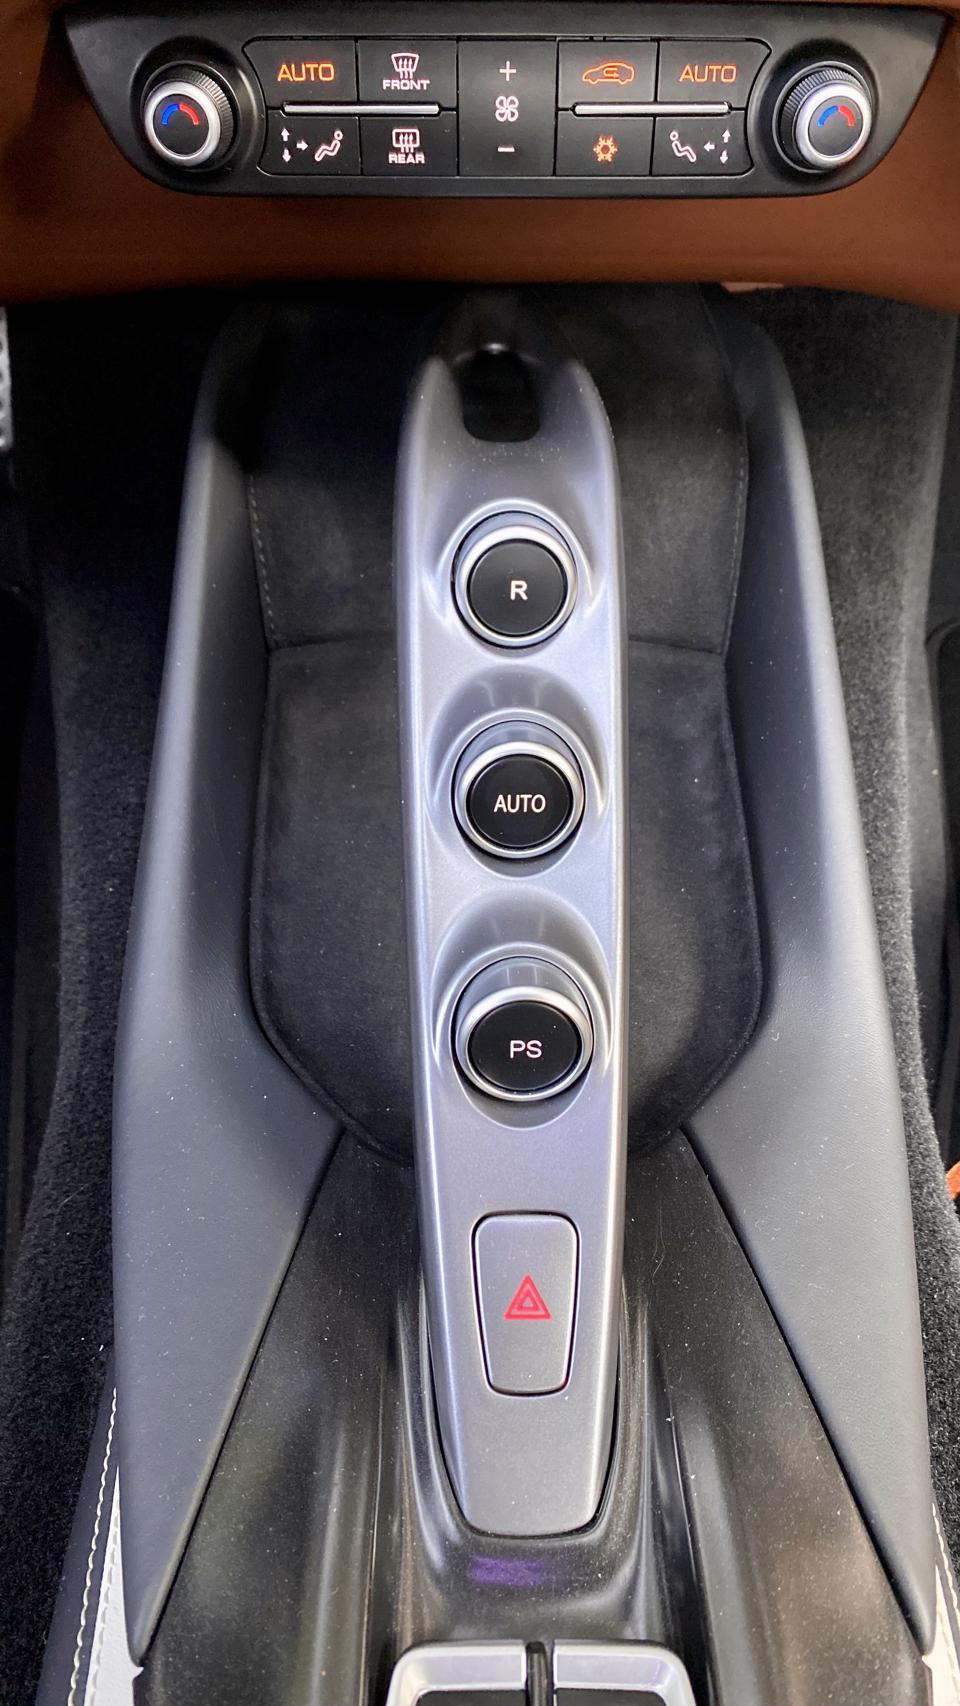 Ferrari Arch: Launch Control, Automatic, and Reverse.